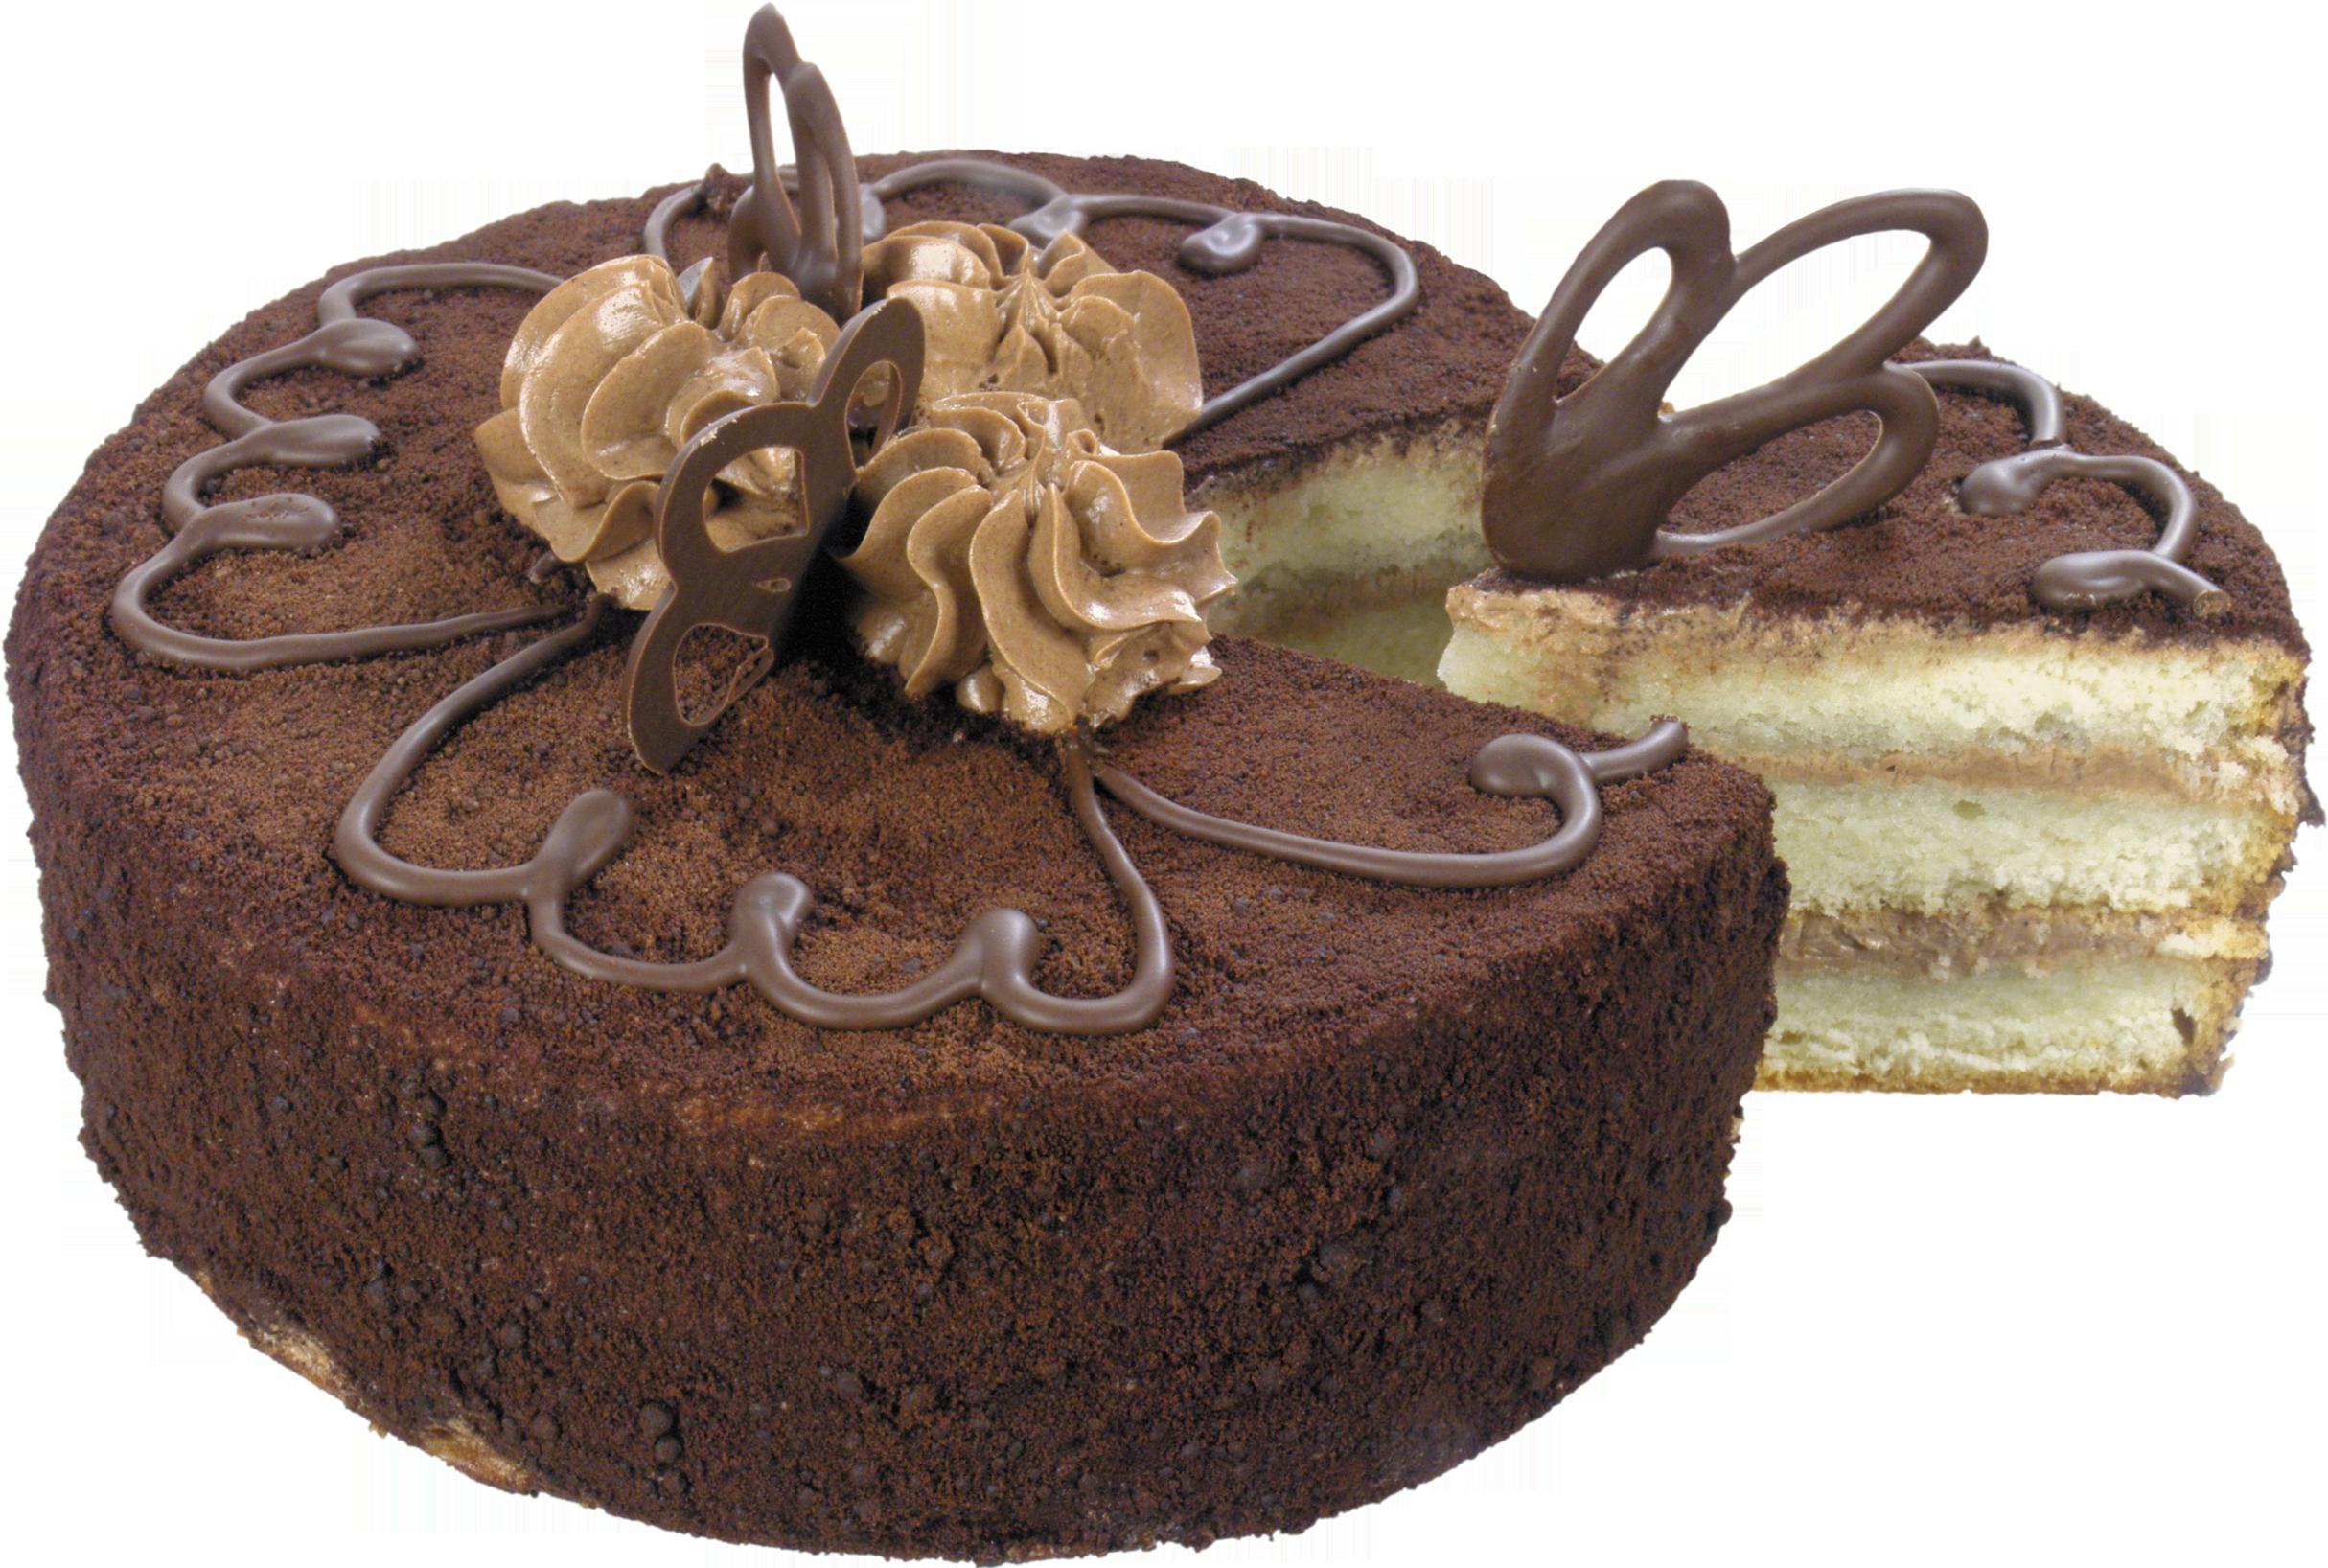 German clipart cartoon. Baked goods chocolate cake